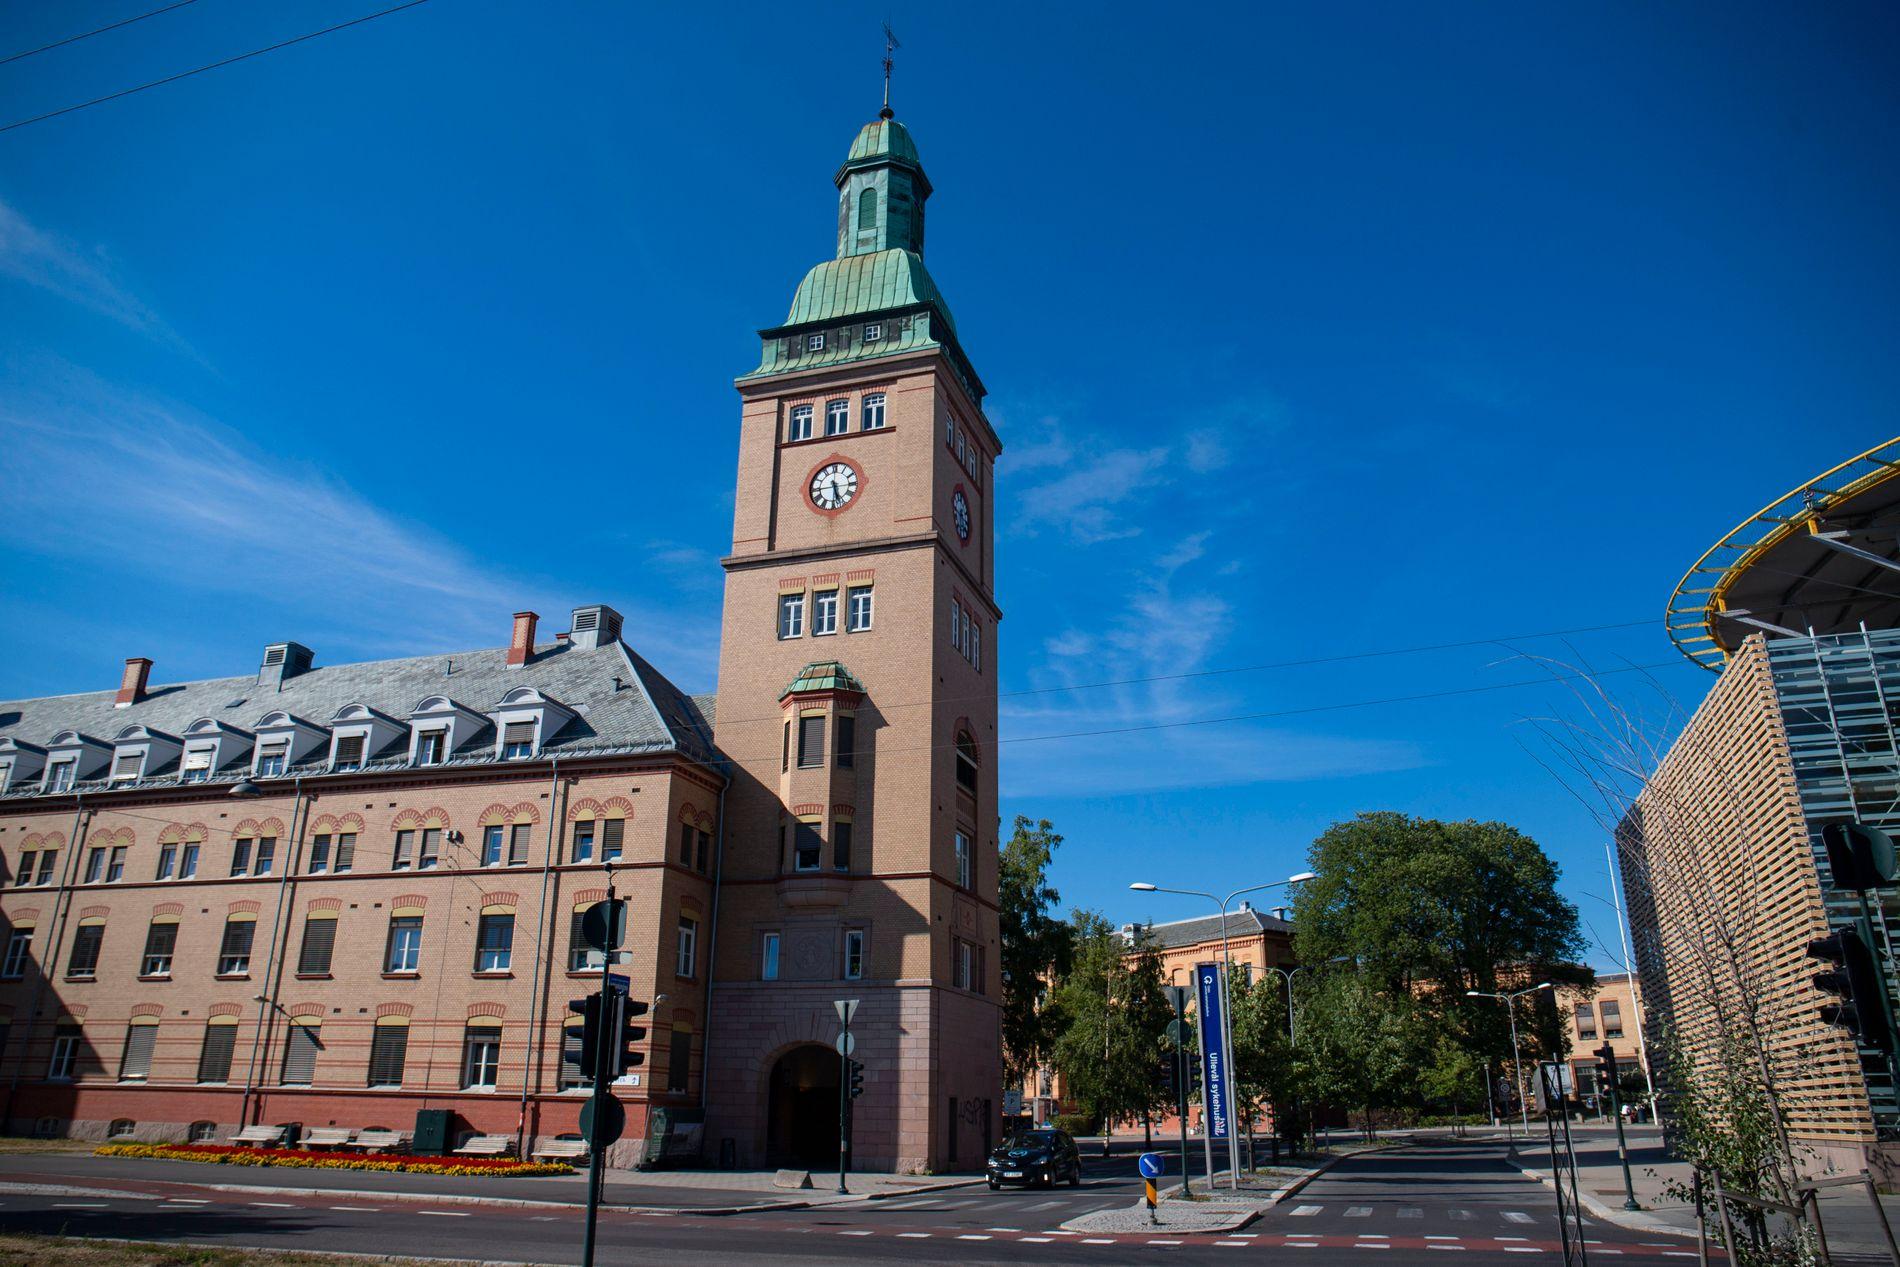 Ullevål sykehus i Oslo skal etter planen legges ned. Foto: Fredrik Hagen / NTB scanpix.